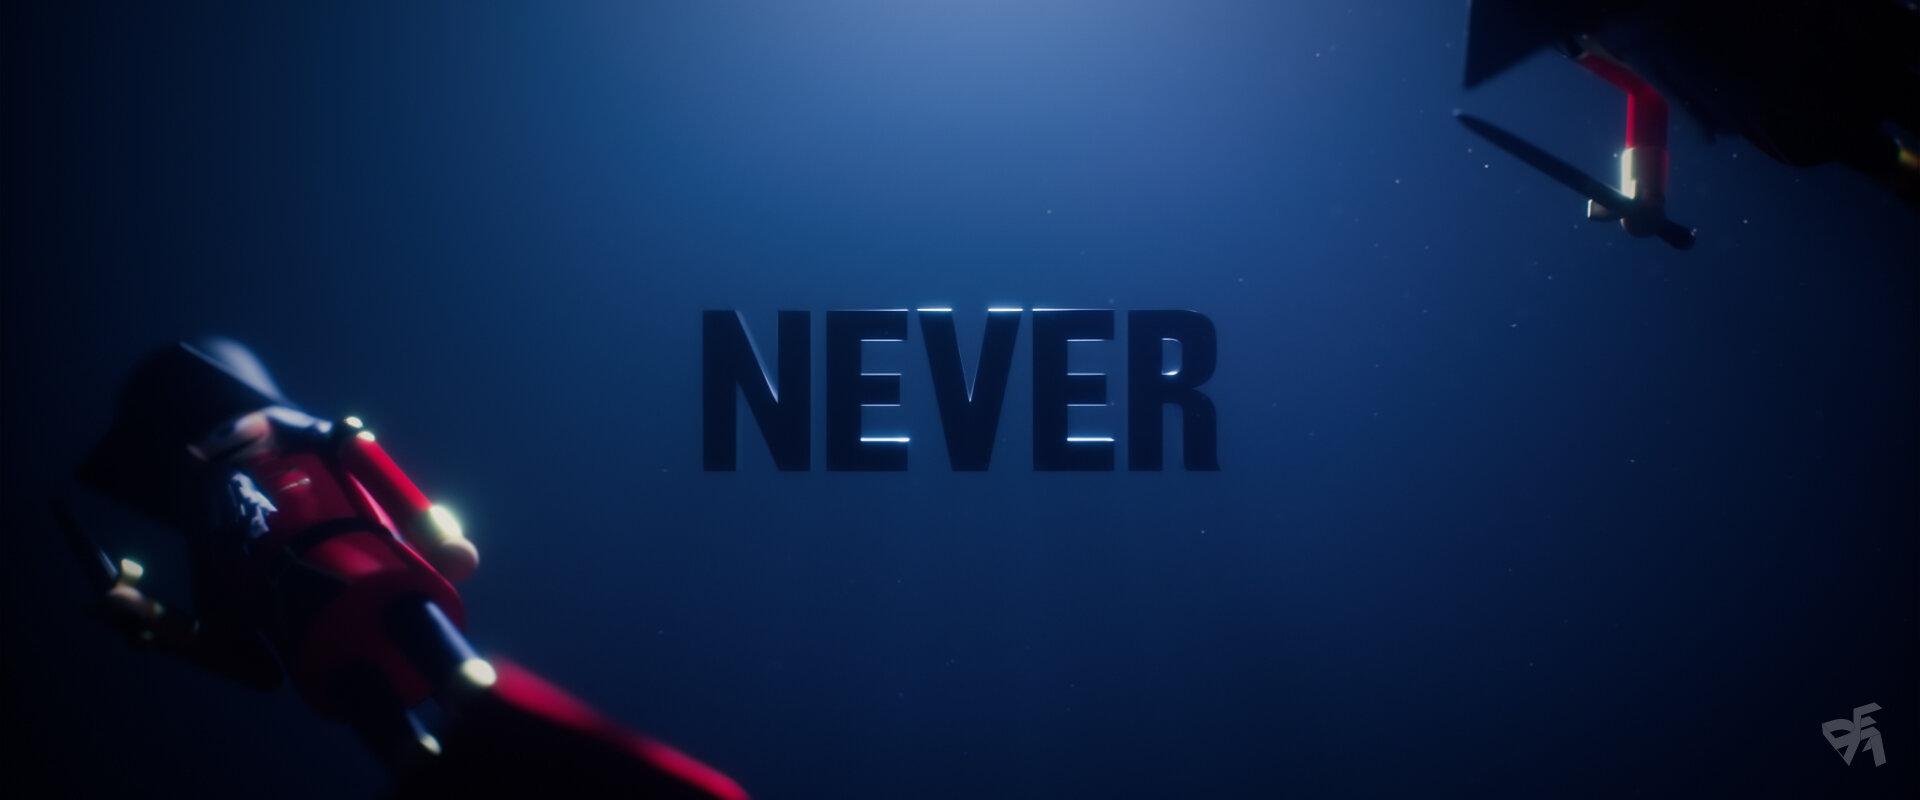 CARD_05_Never.jpg